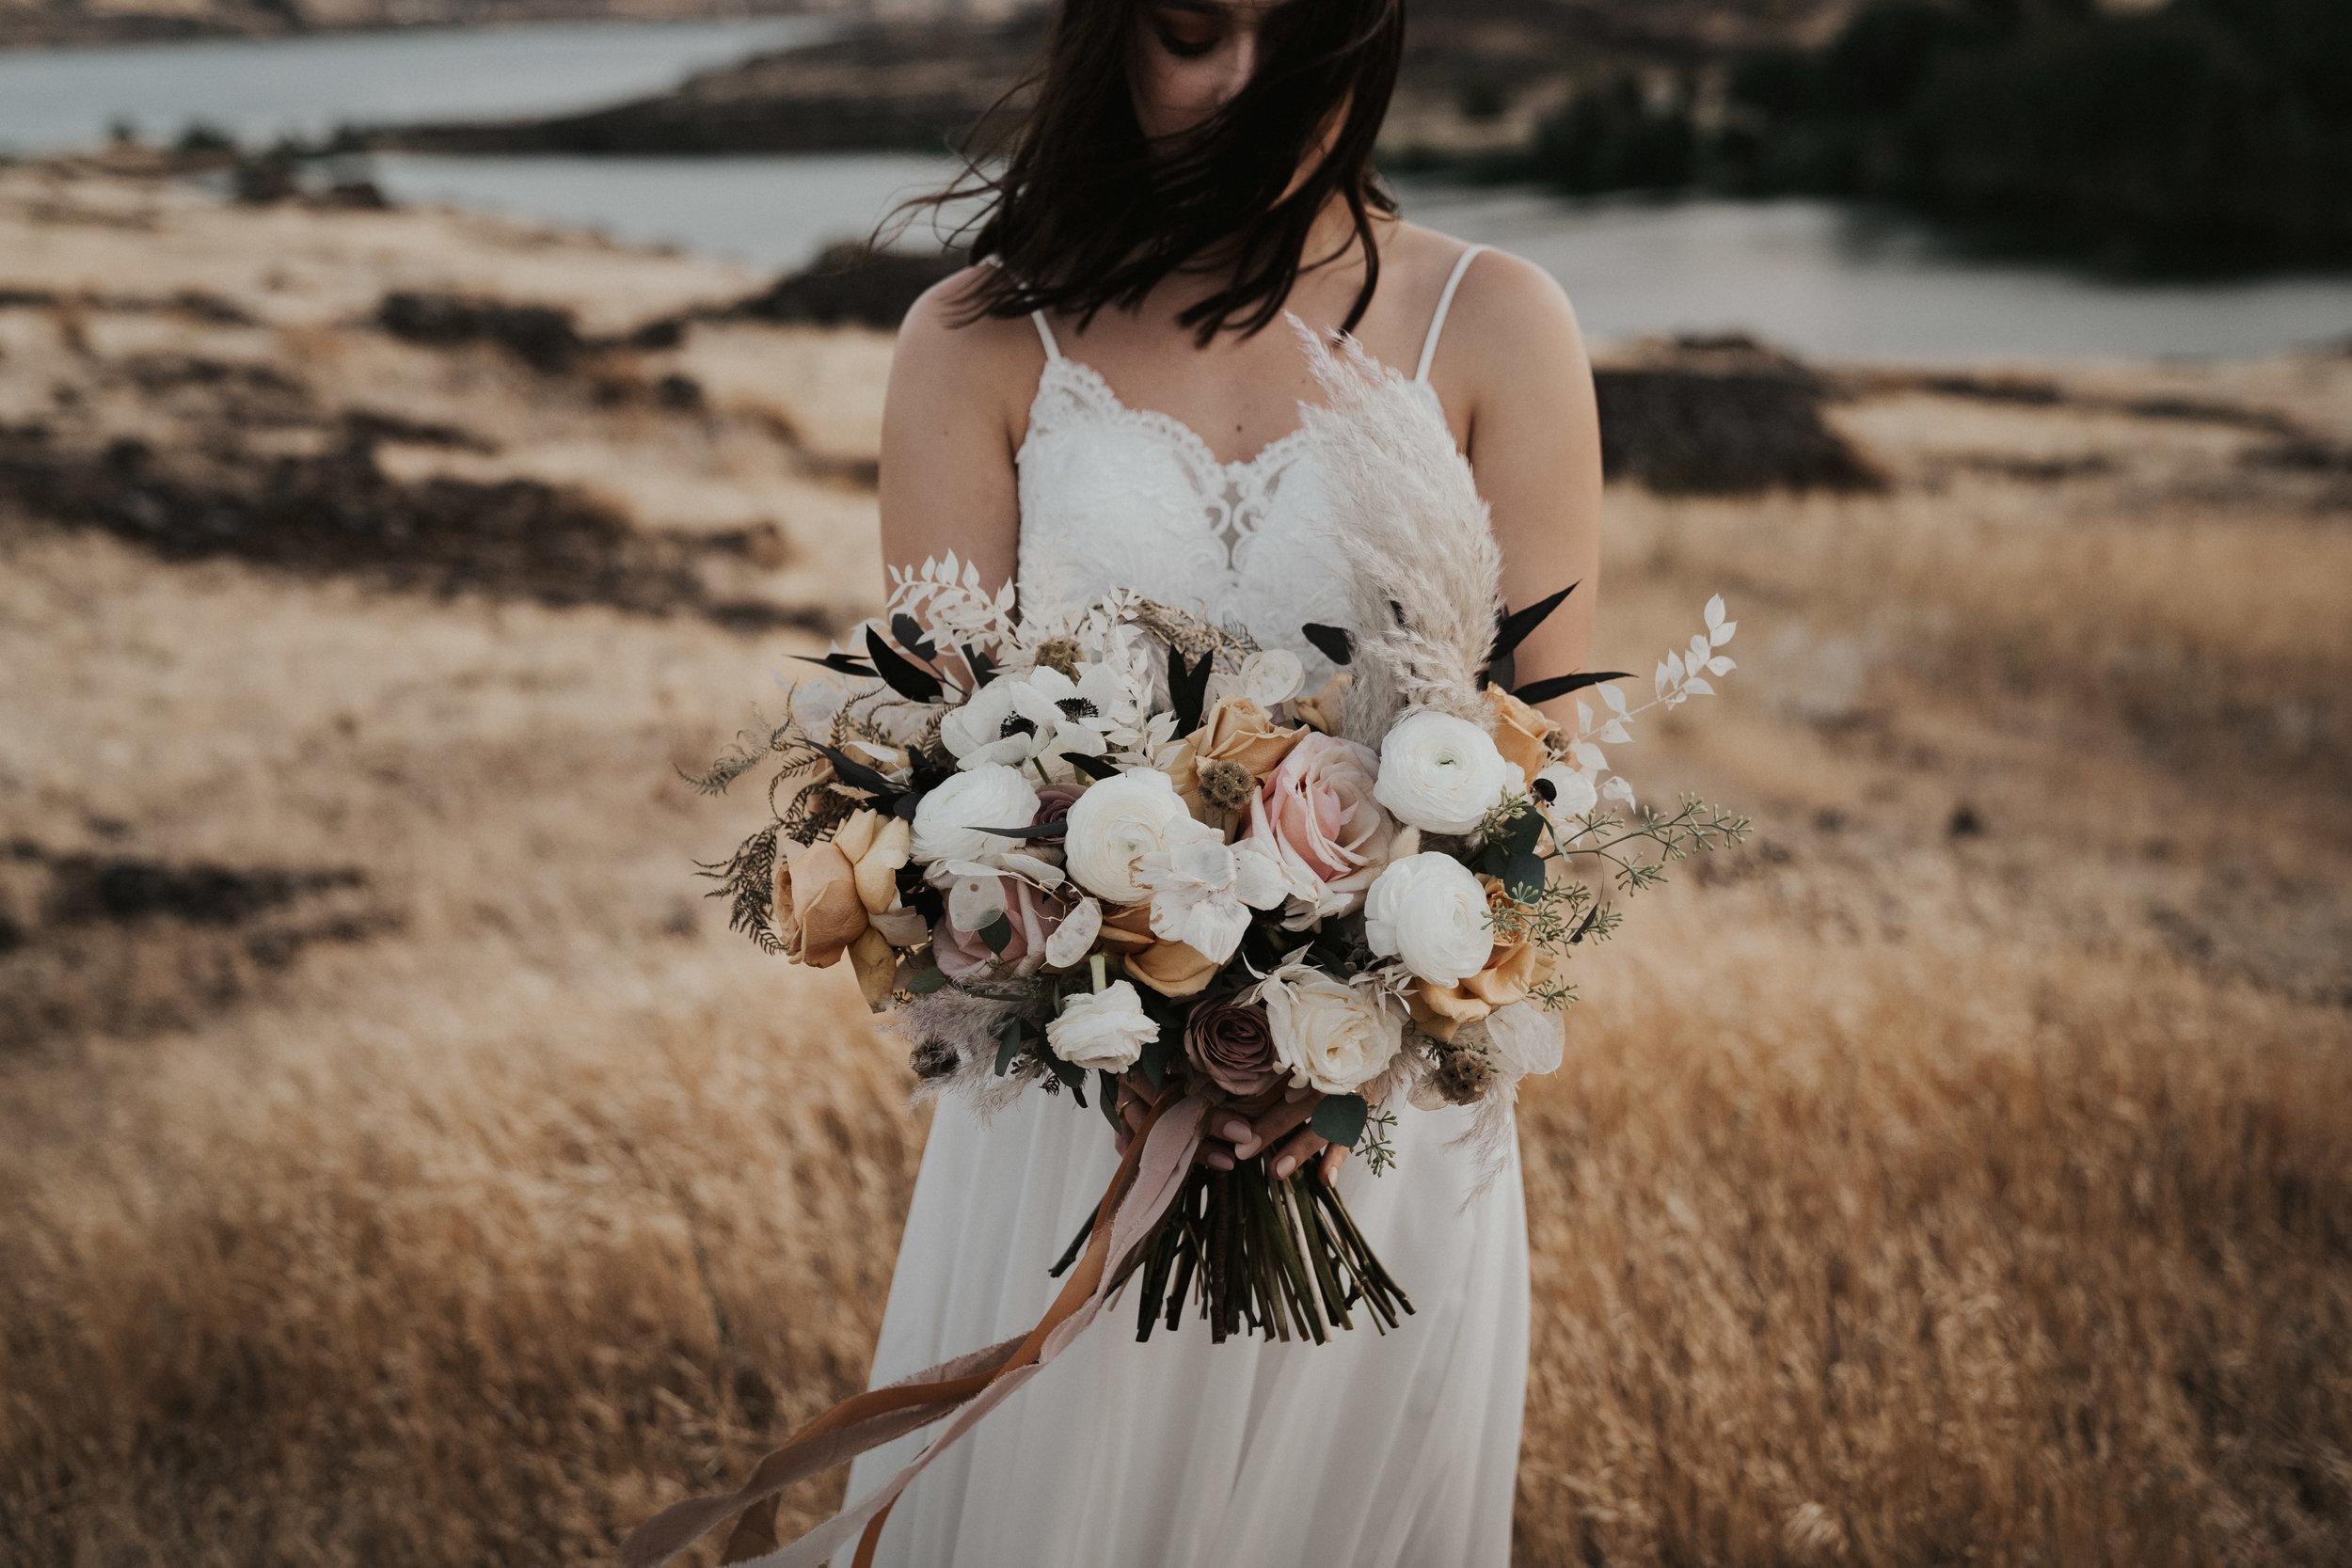 columbia-river-gorge-wedding-elopement-inspiration-40.jpg